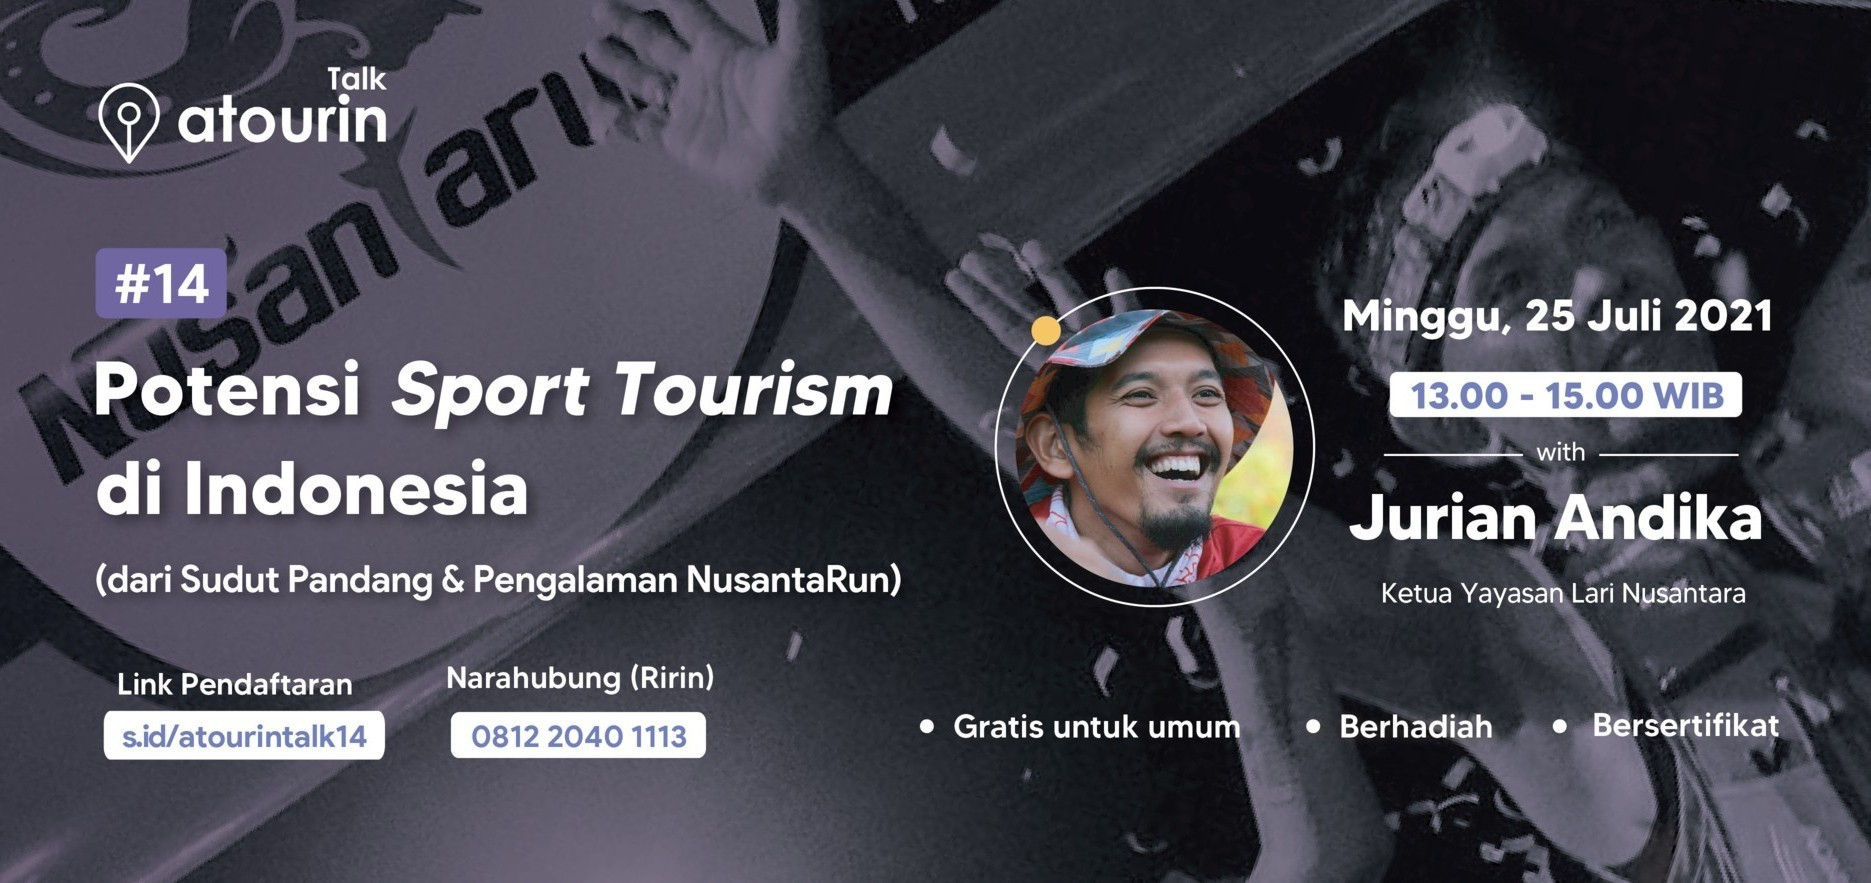 Atourin Talk: Potensi Sport Tourism di Indonesia